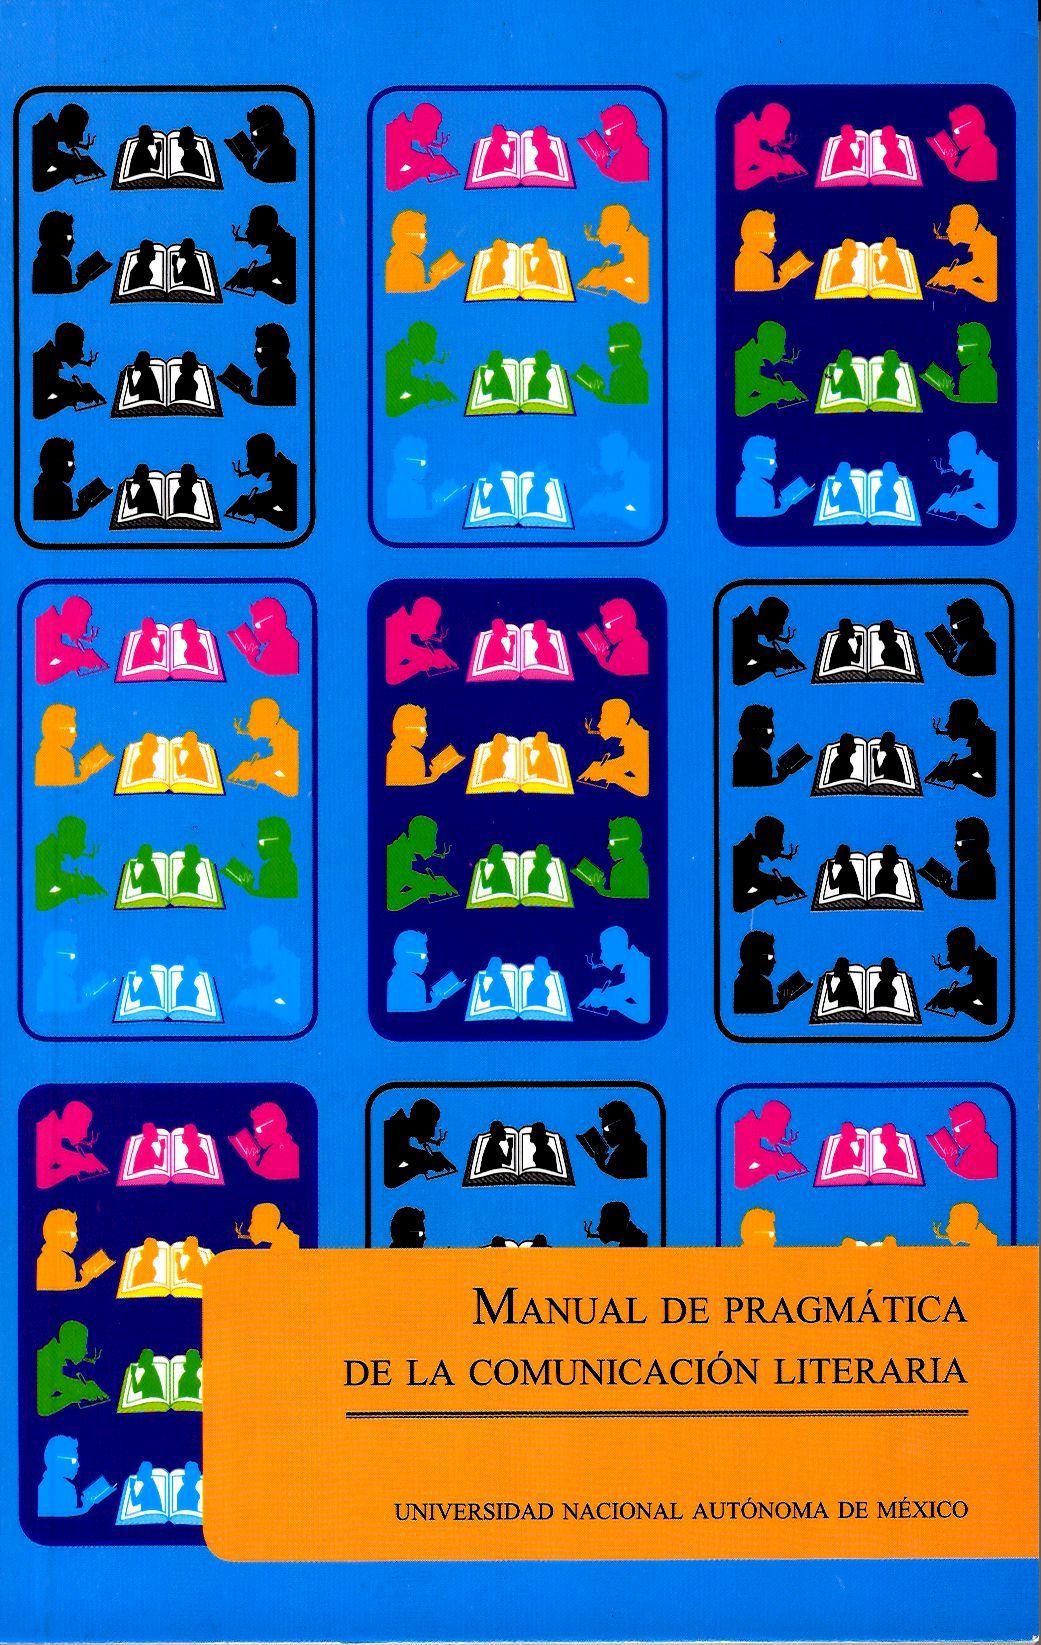 Manual de pragmática  de la comunicación literaria